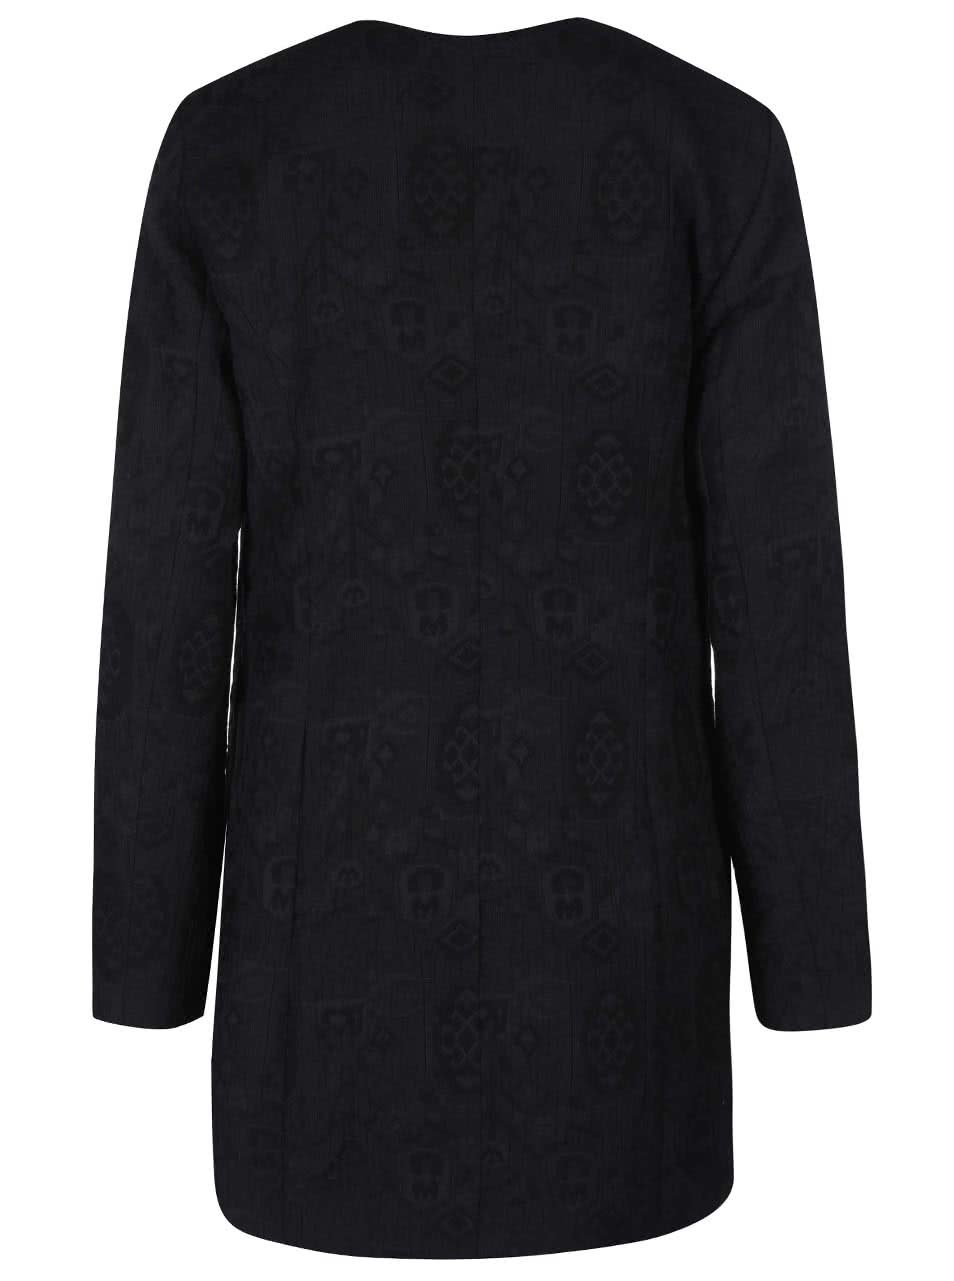 329b6ceff Čierny dámsky kabát s.Oliver | ZOOT.sk